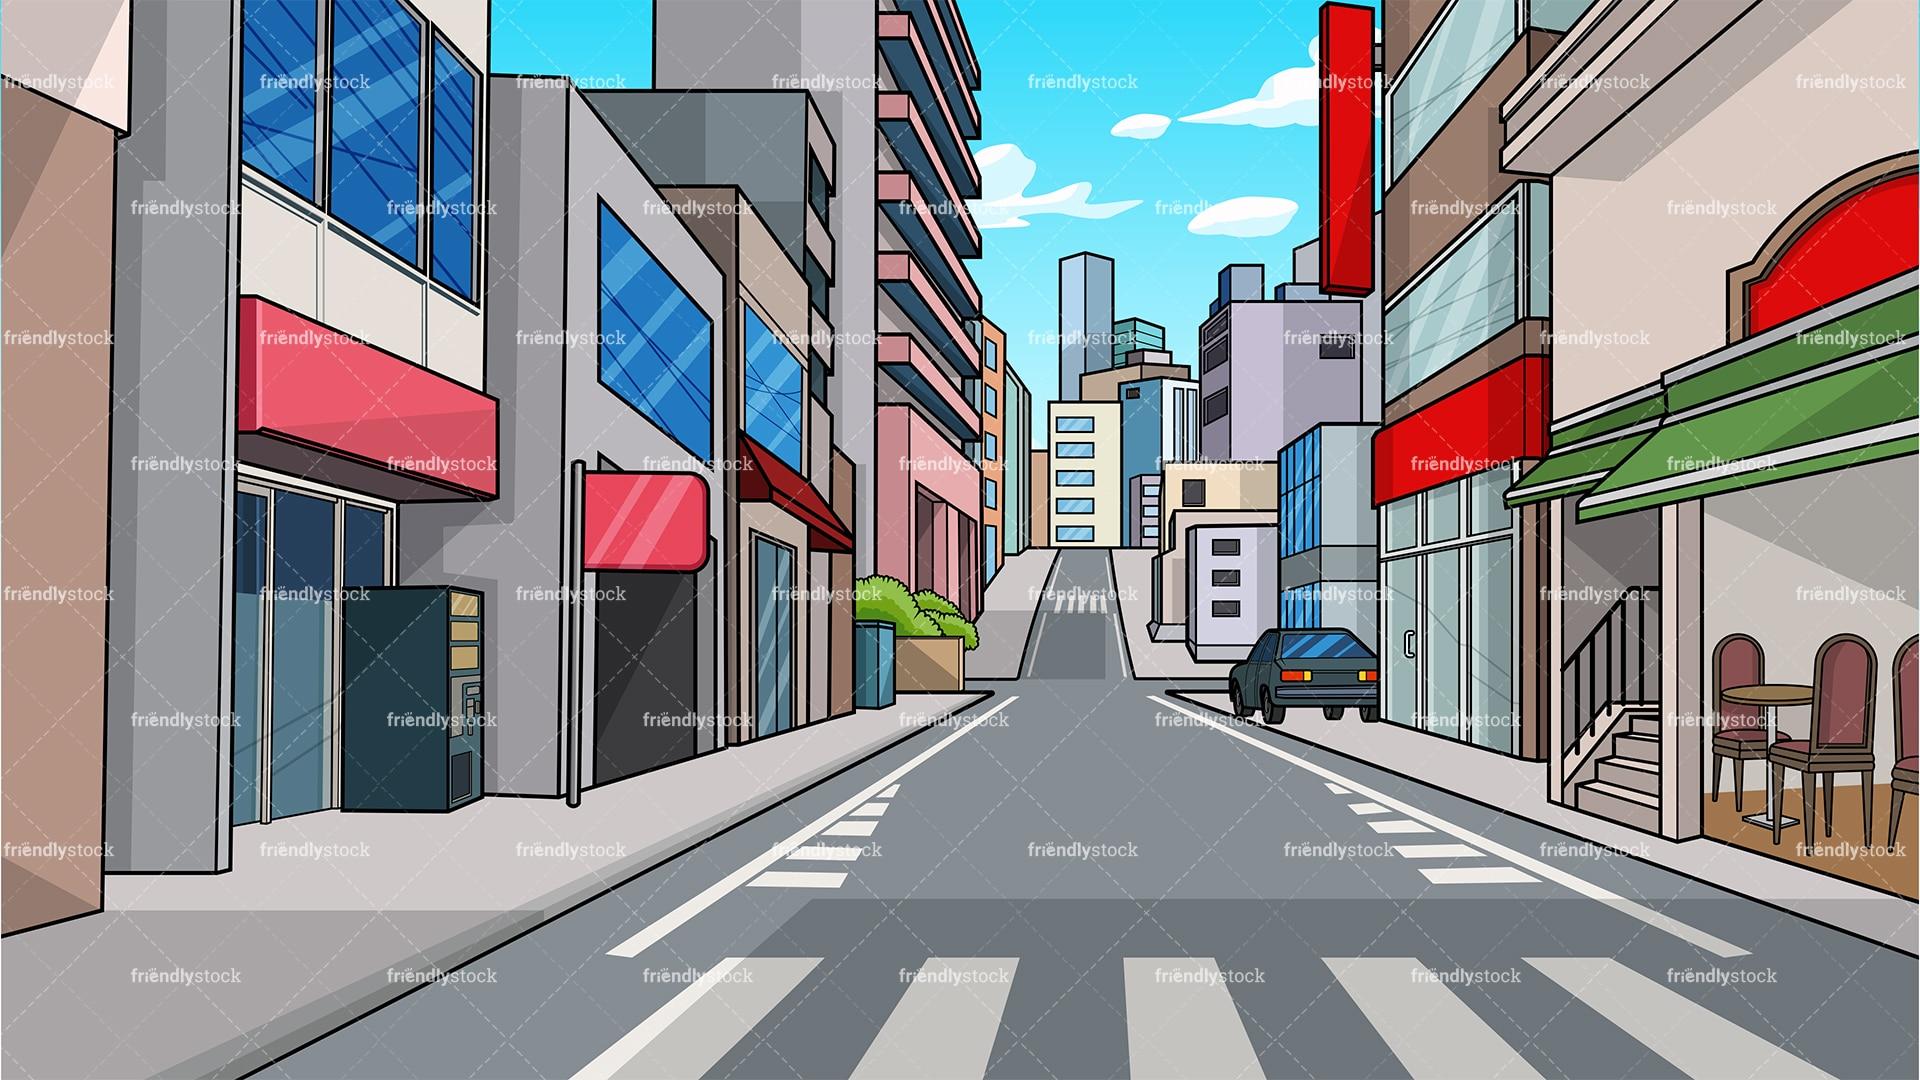 City Street Background Cartoon Clipart Vector - FriendlyStock